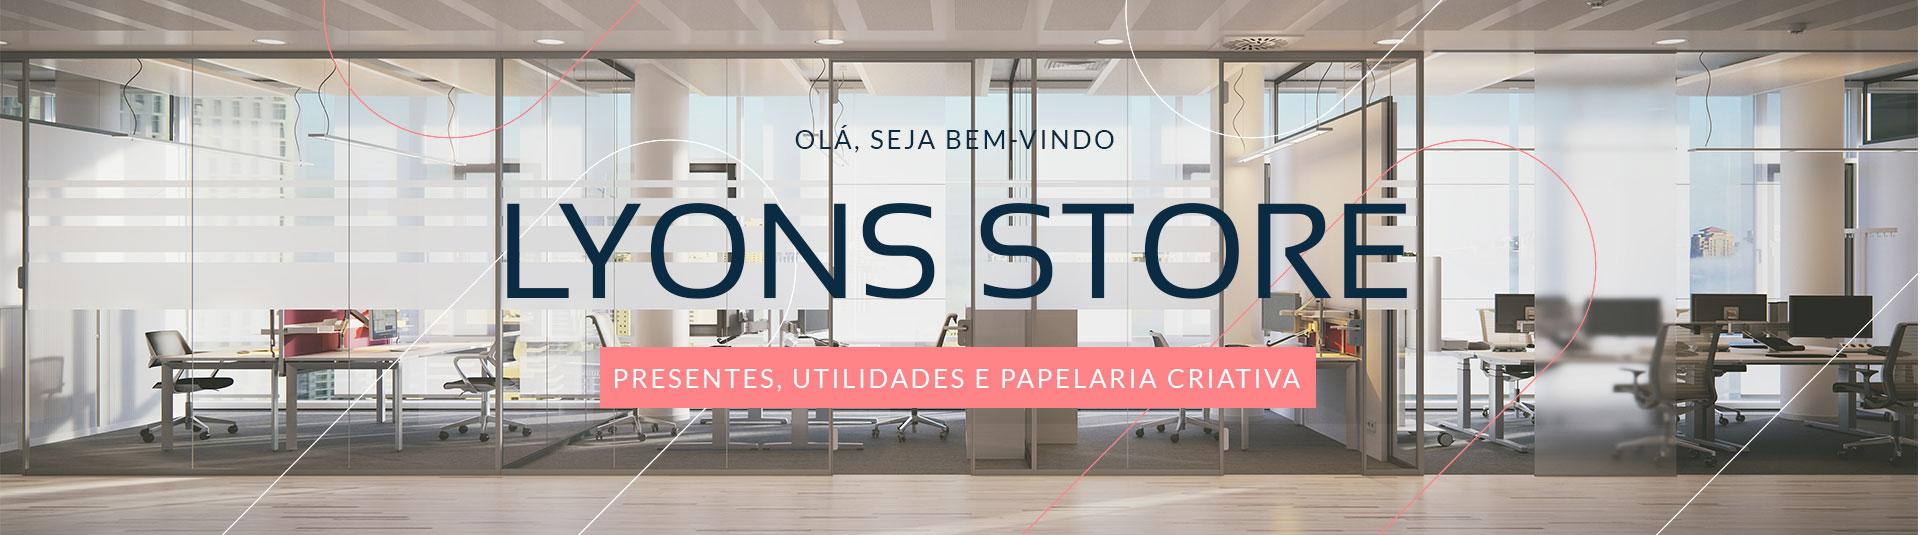 Lyons Store - Goiânia-GO